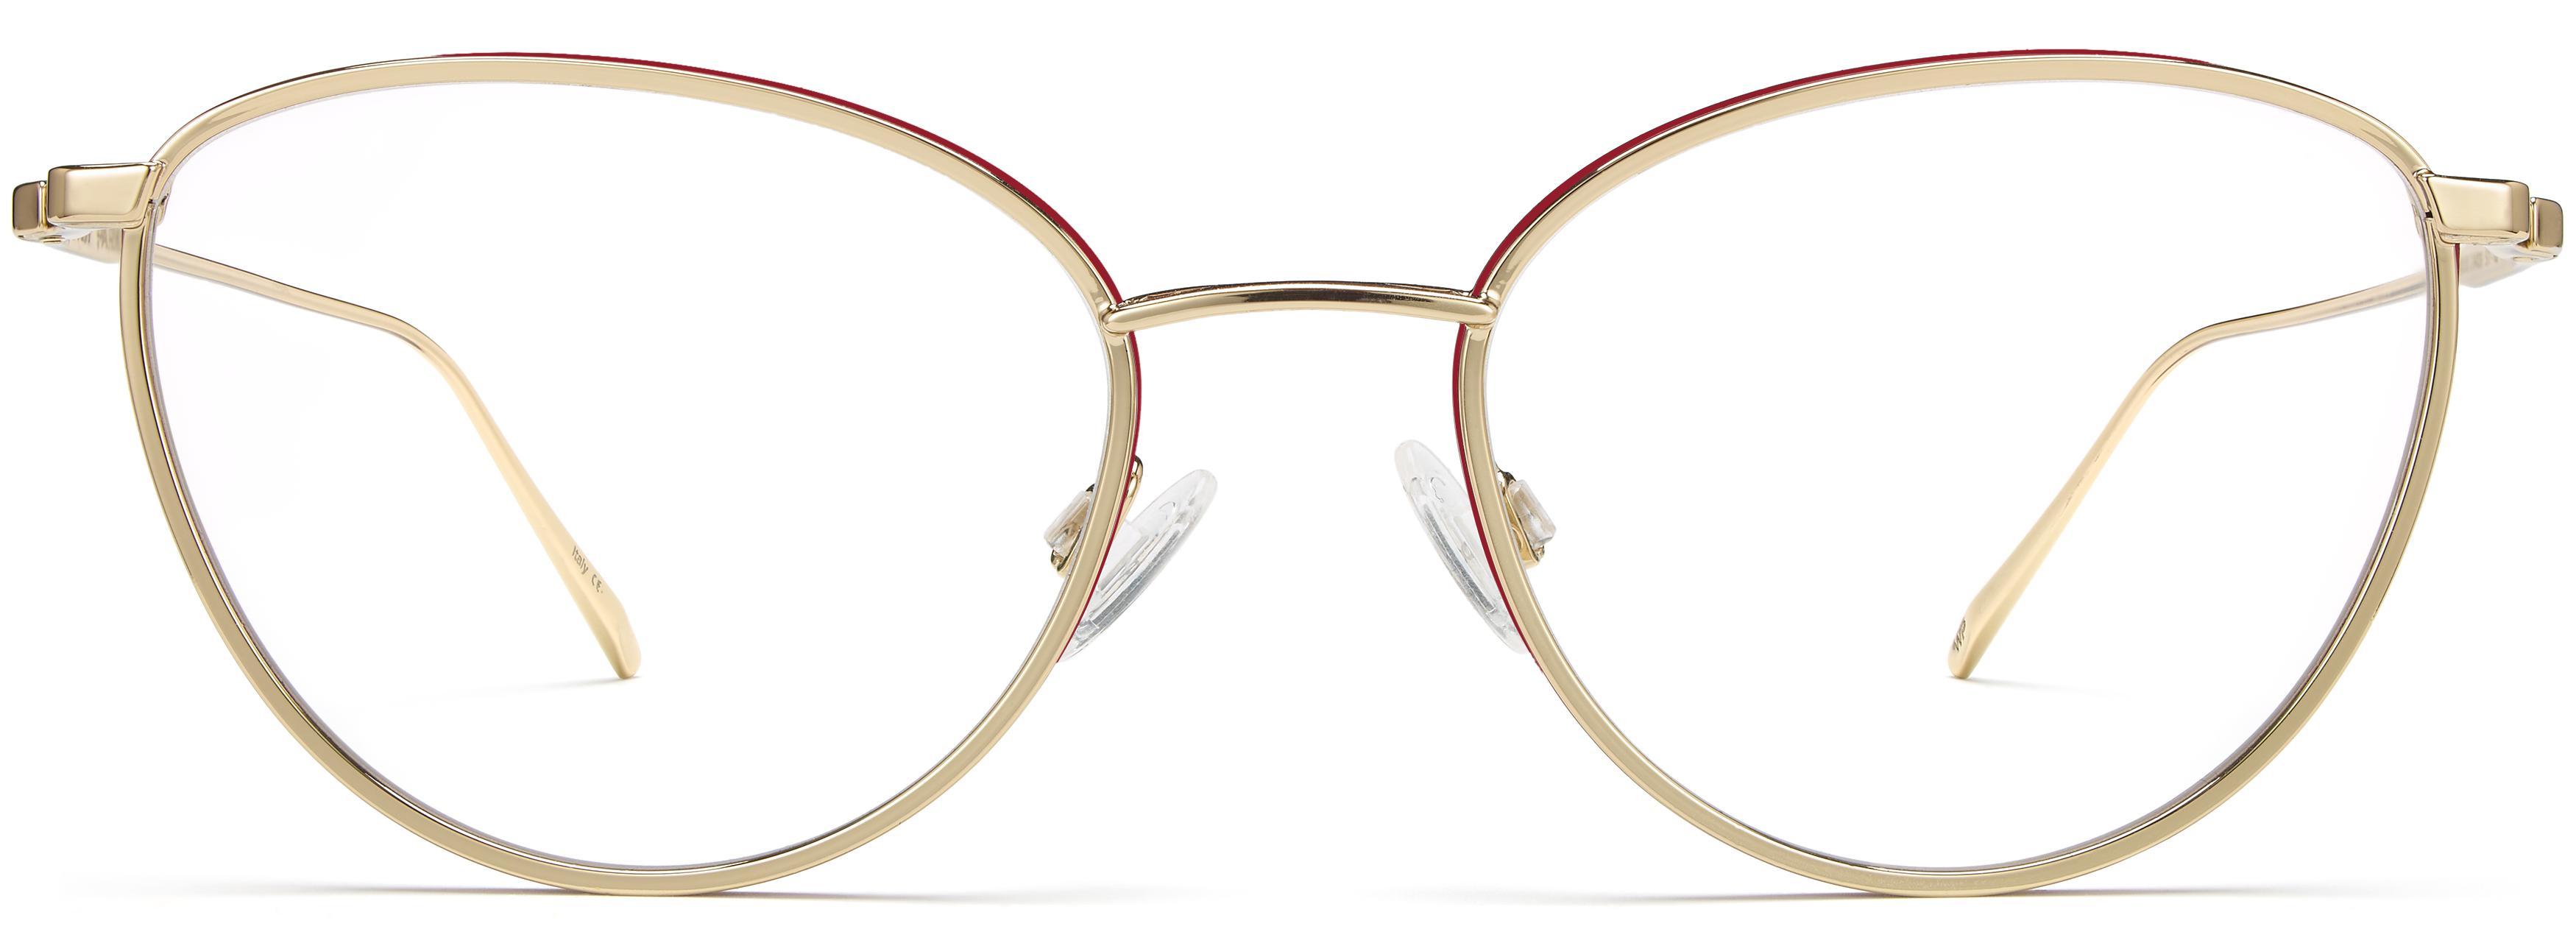 feac449848a9 Women's Eyeglasses | Warby Parker